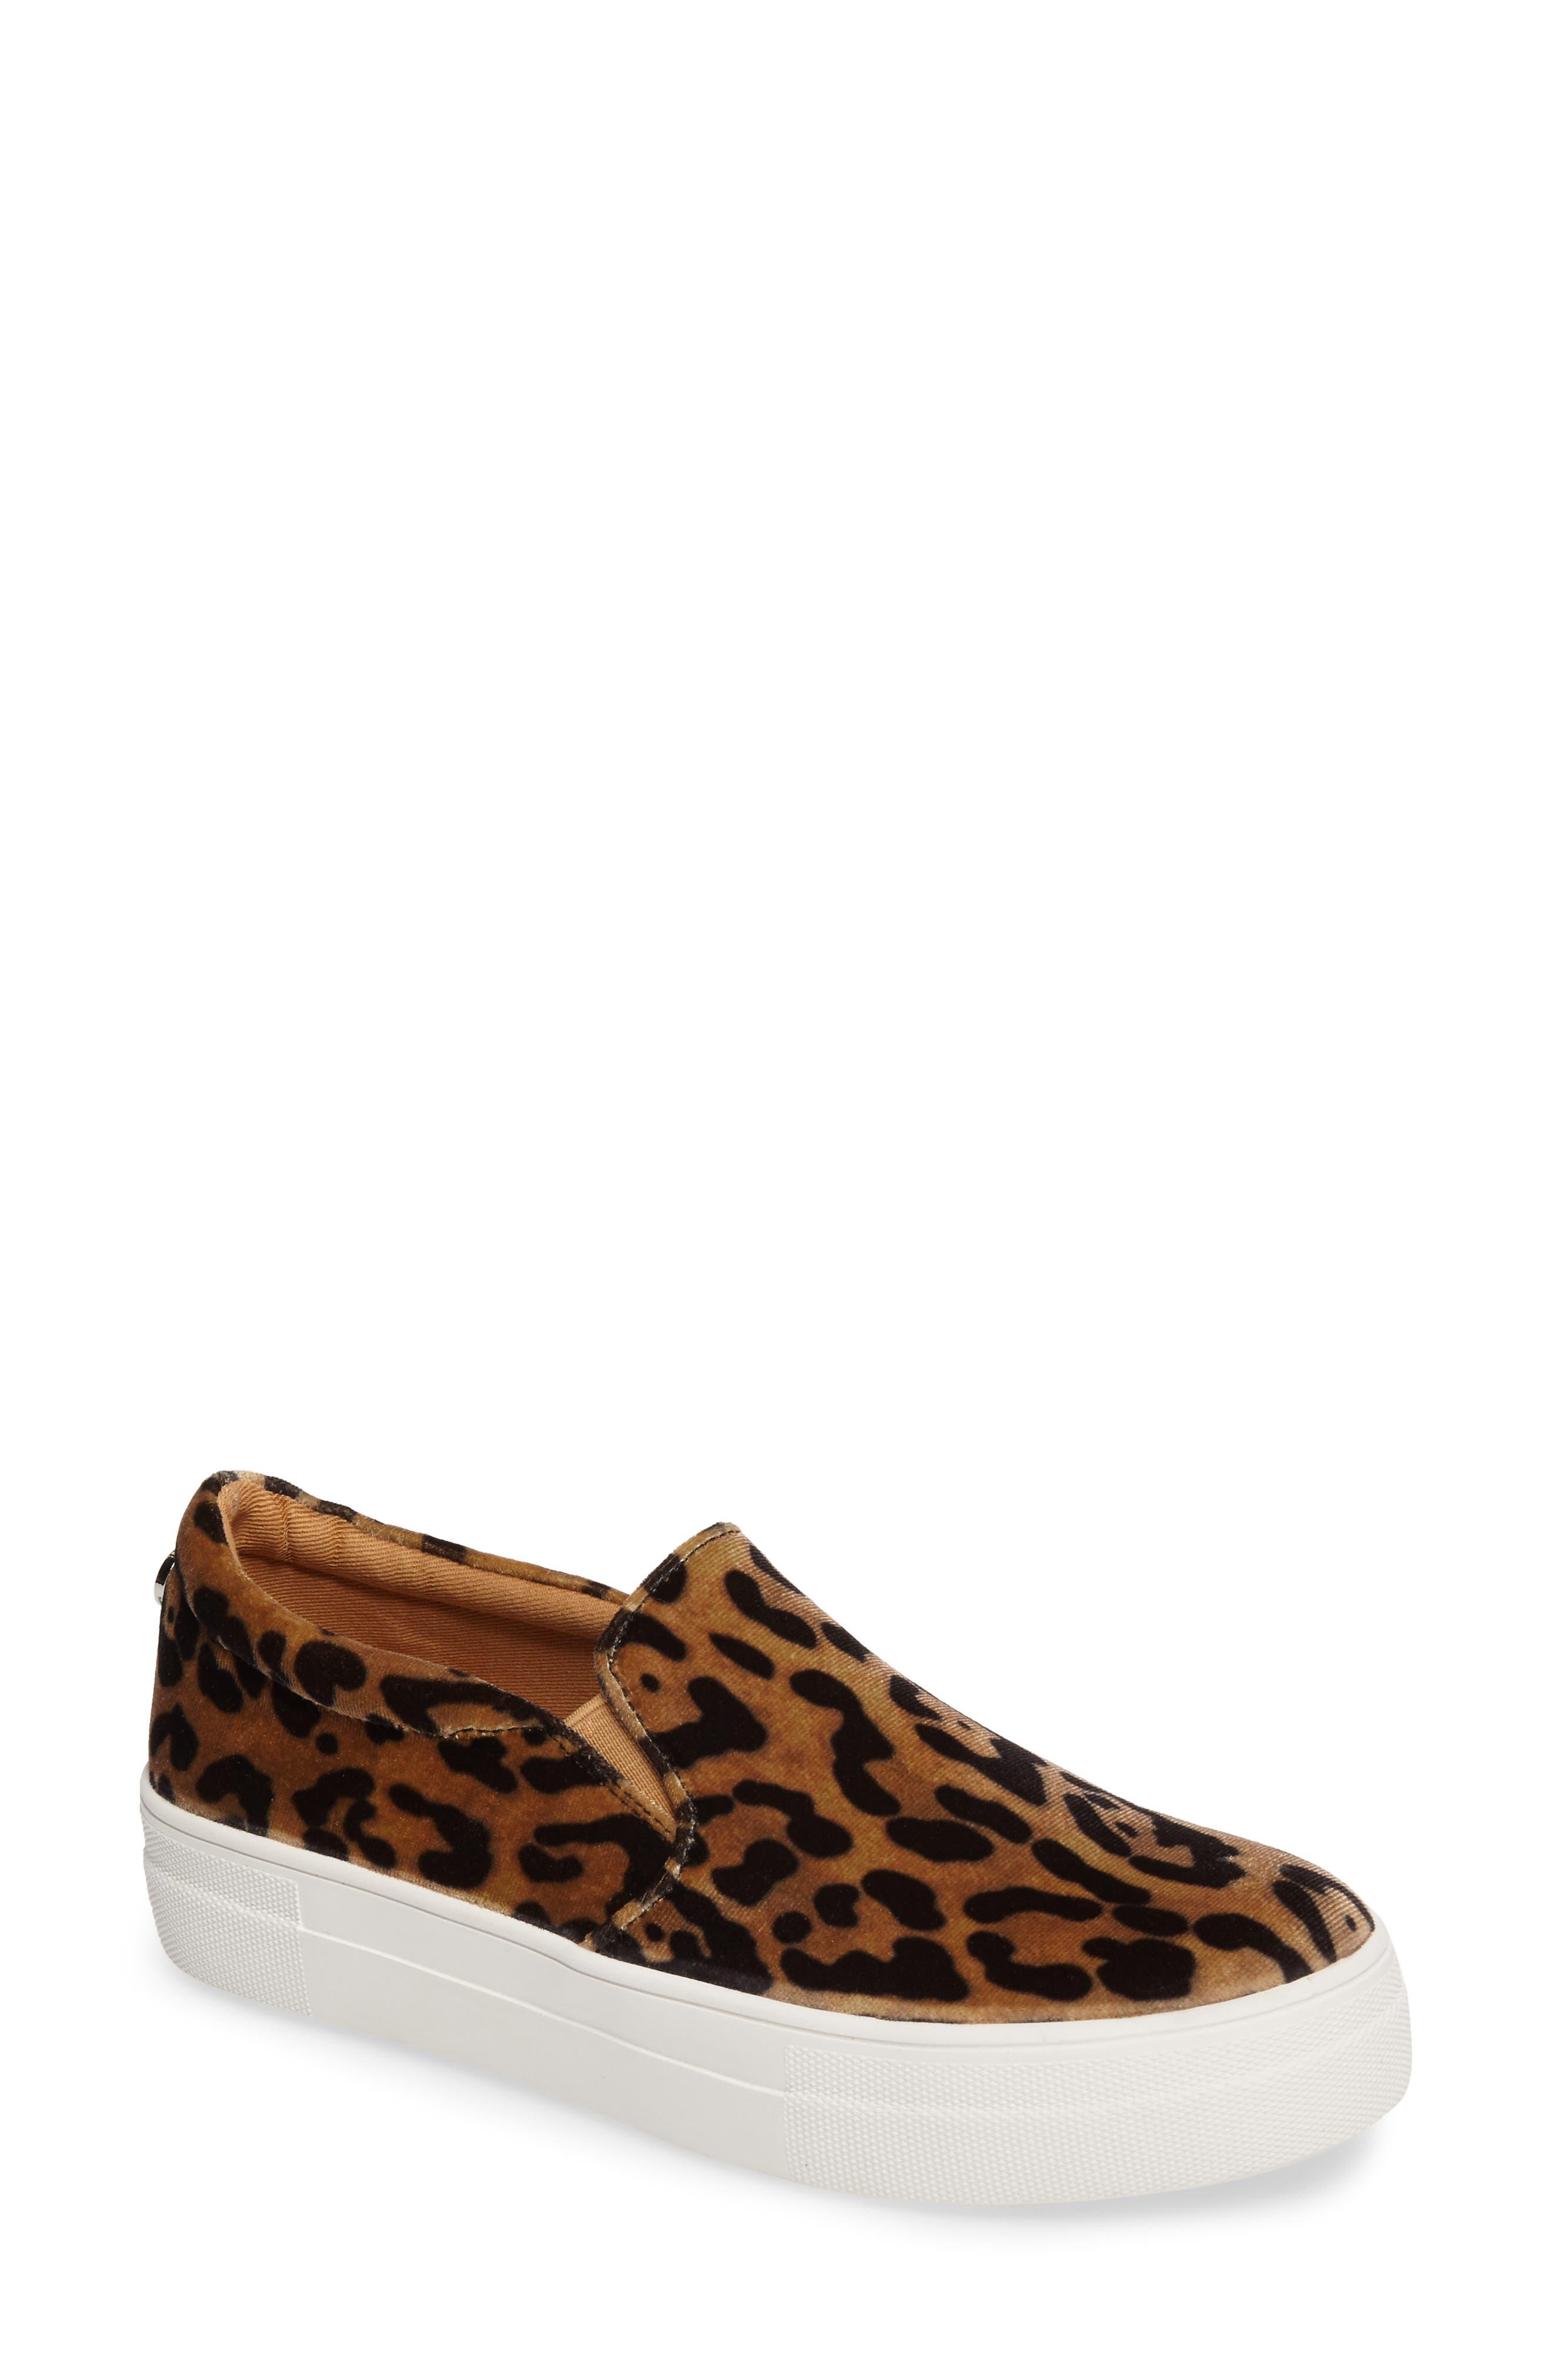 Gills Platform Slip-On Sneaker,                             Main thumbnail 1, color,                             Leopard